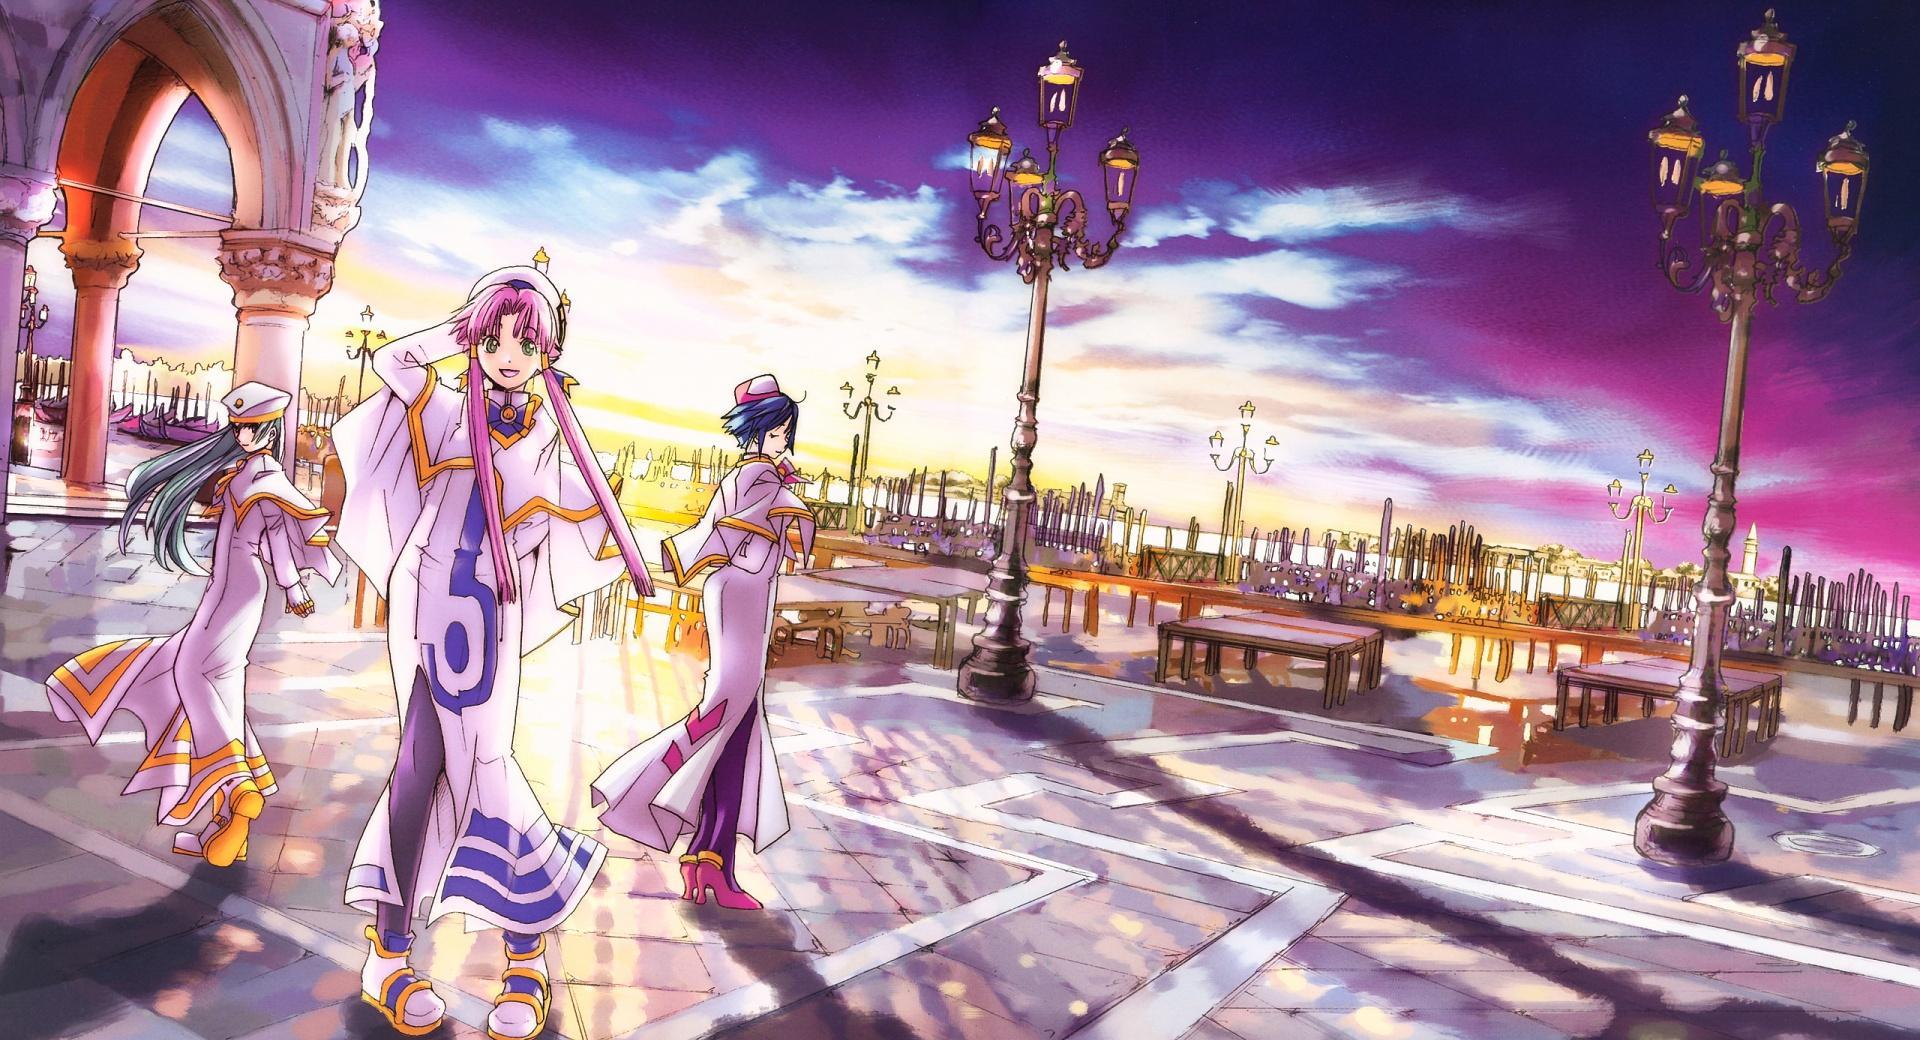 Aria Fantasy Manga wallpapers HD quality